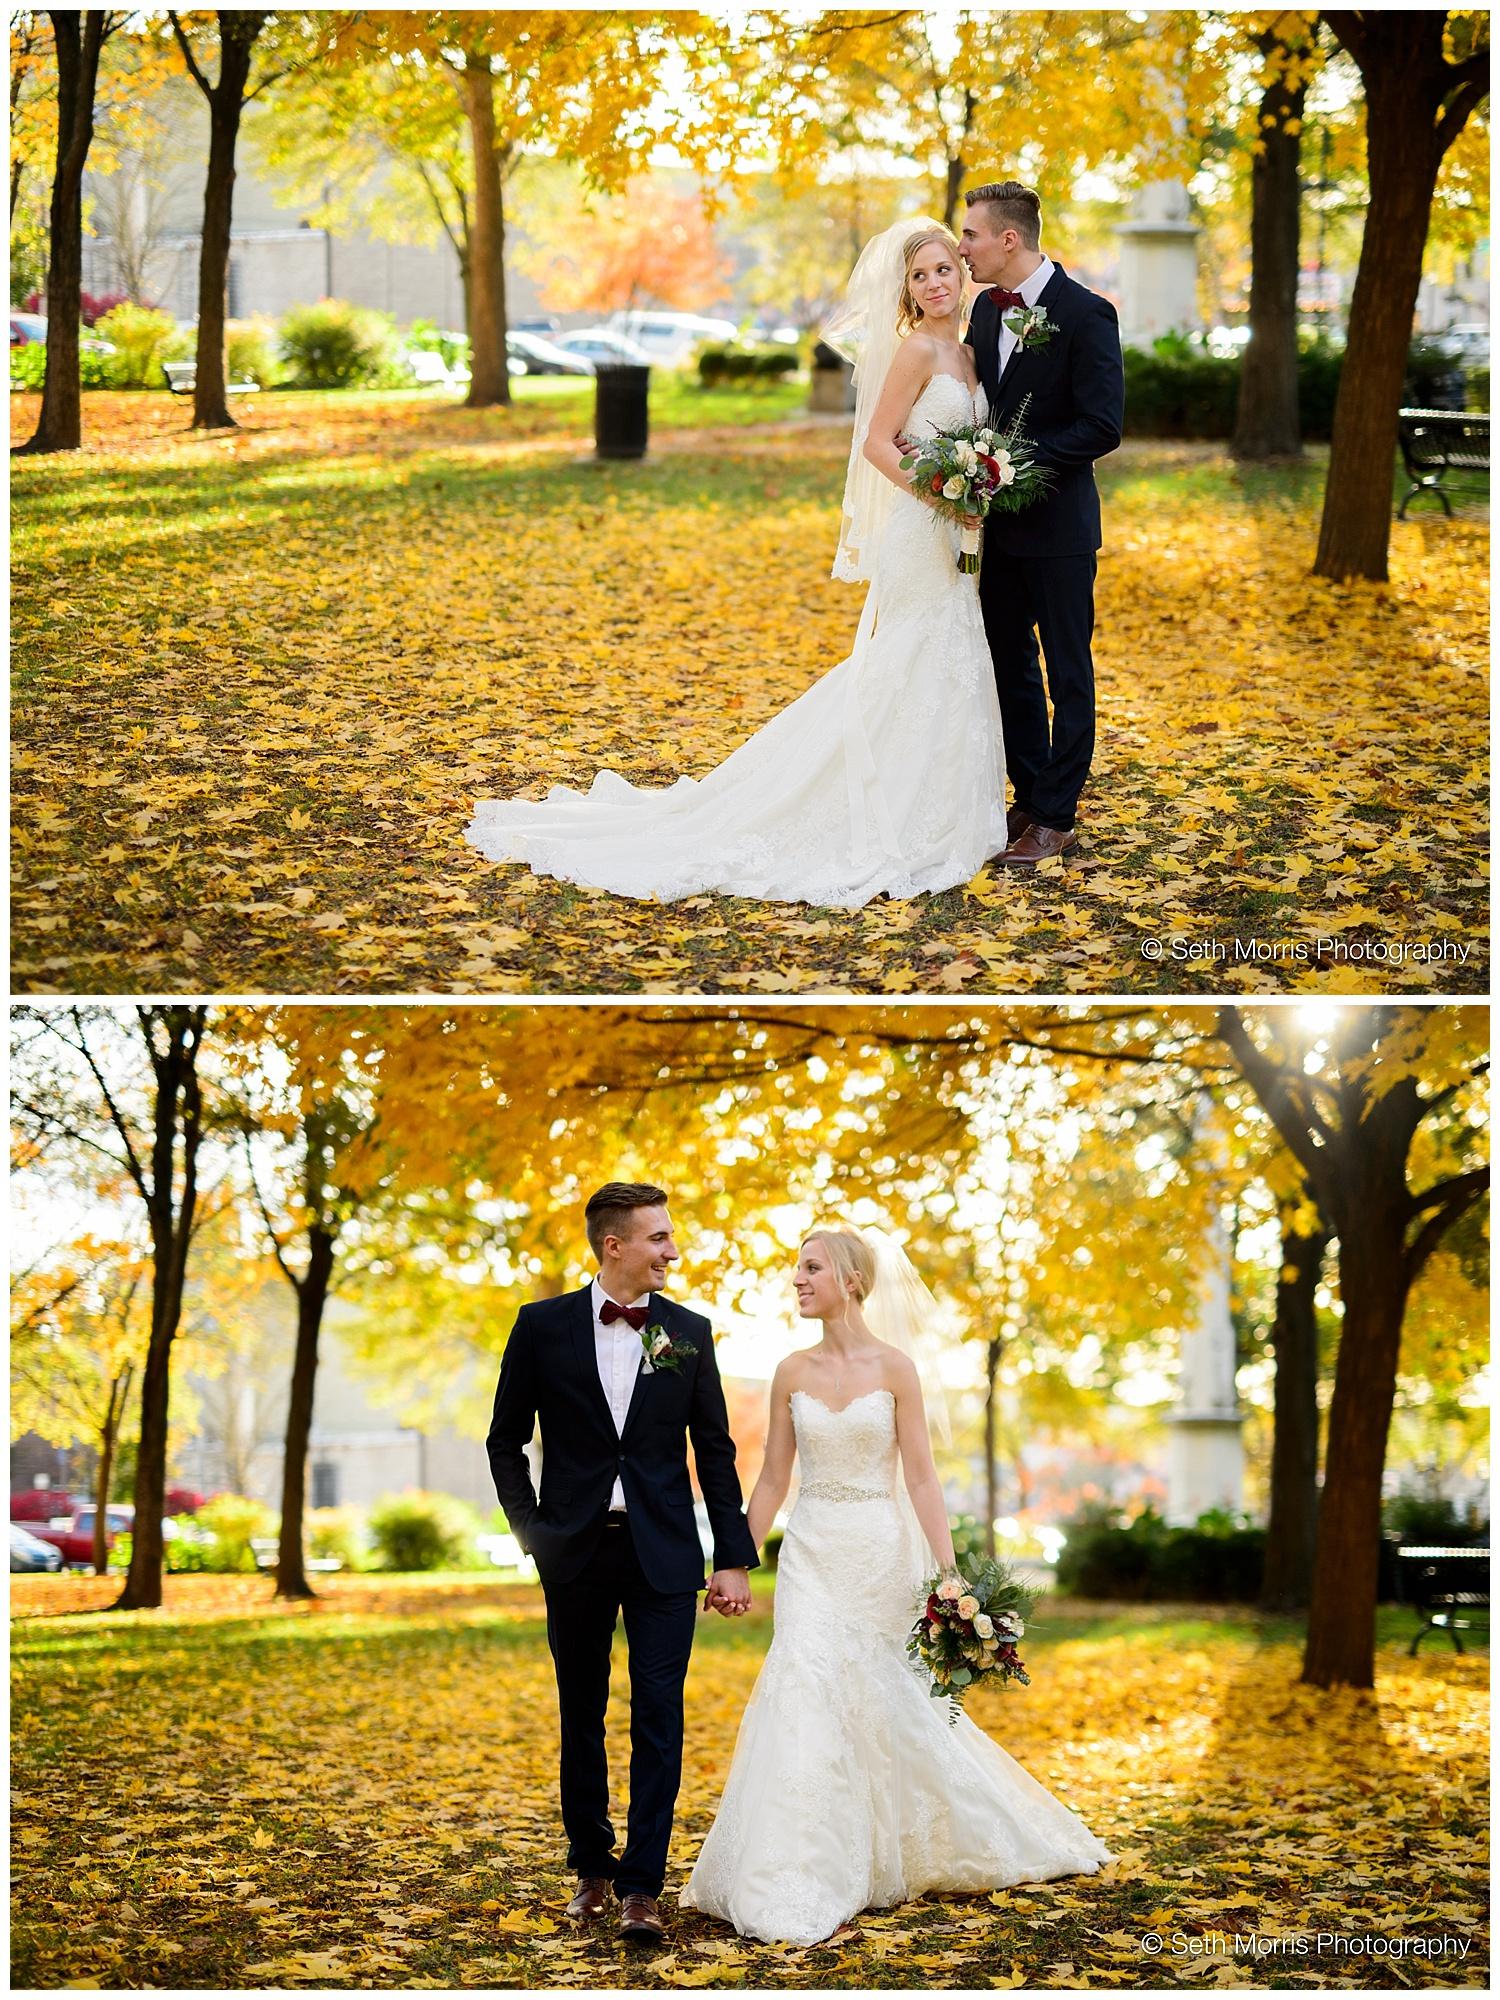 fall-wedding-ottawa-illinois-photographer-66.jpg